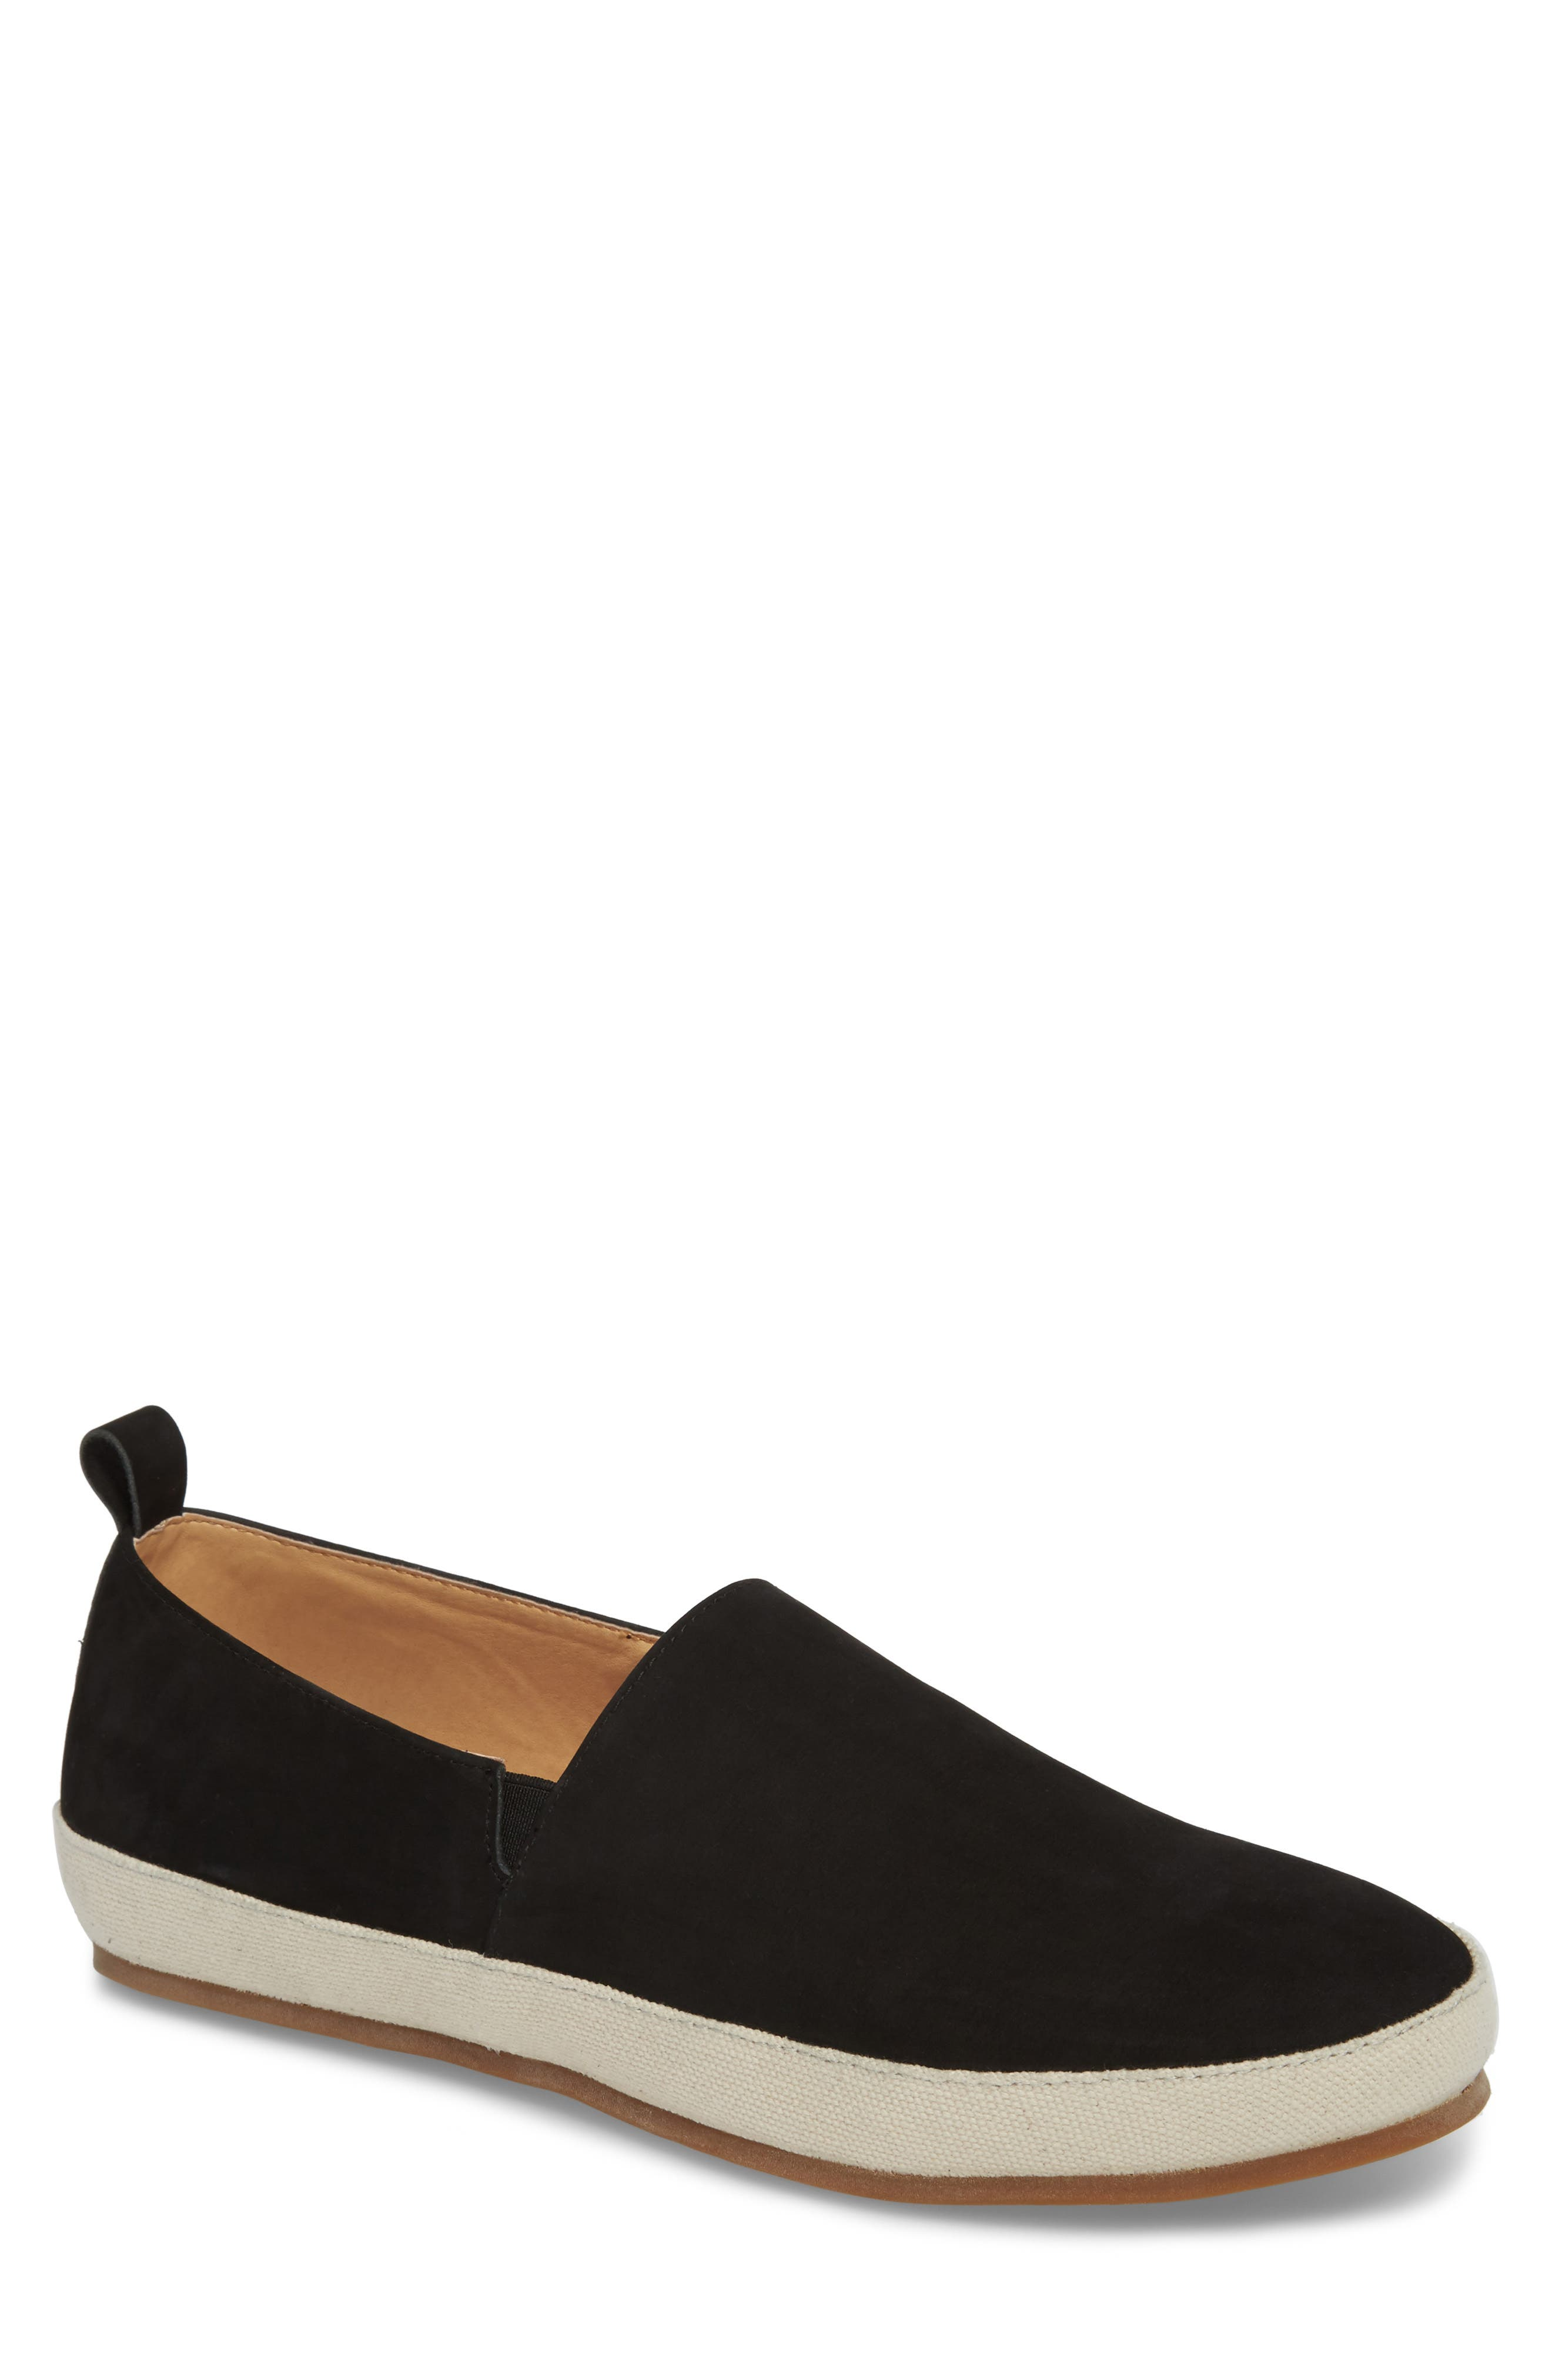 Wynne Slip-On,                         Main,                         color, BLACK SUEDE